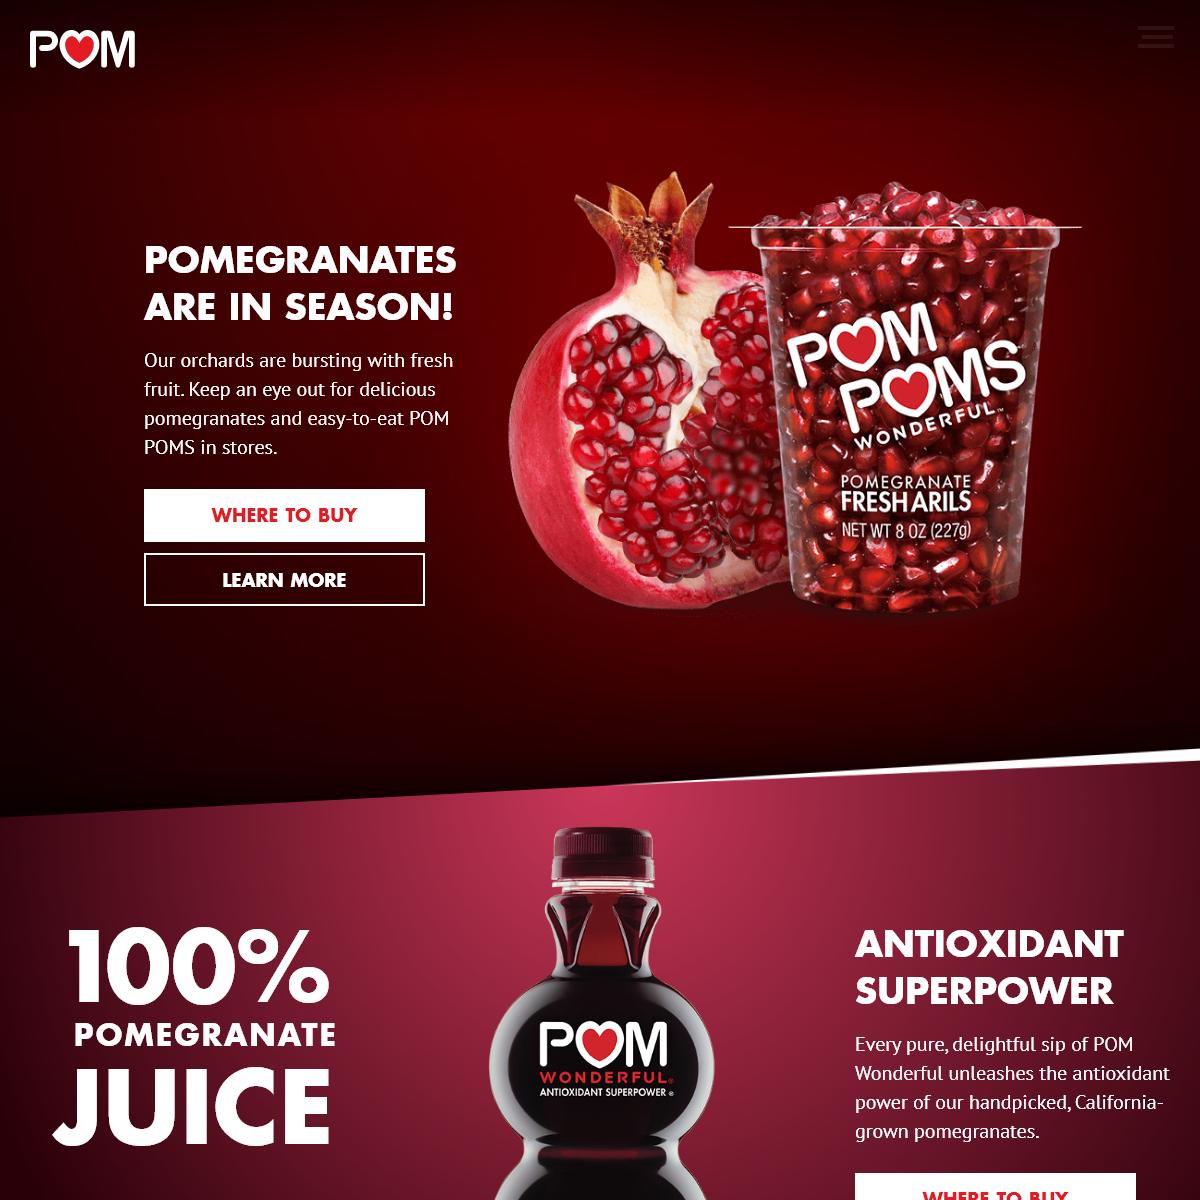 POM Wonderful – 100- Pomegranate Juice